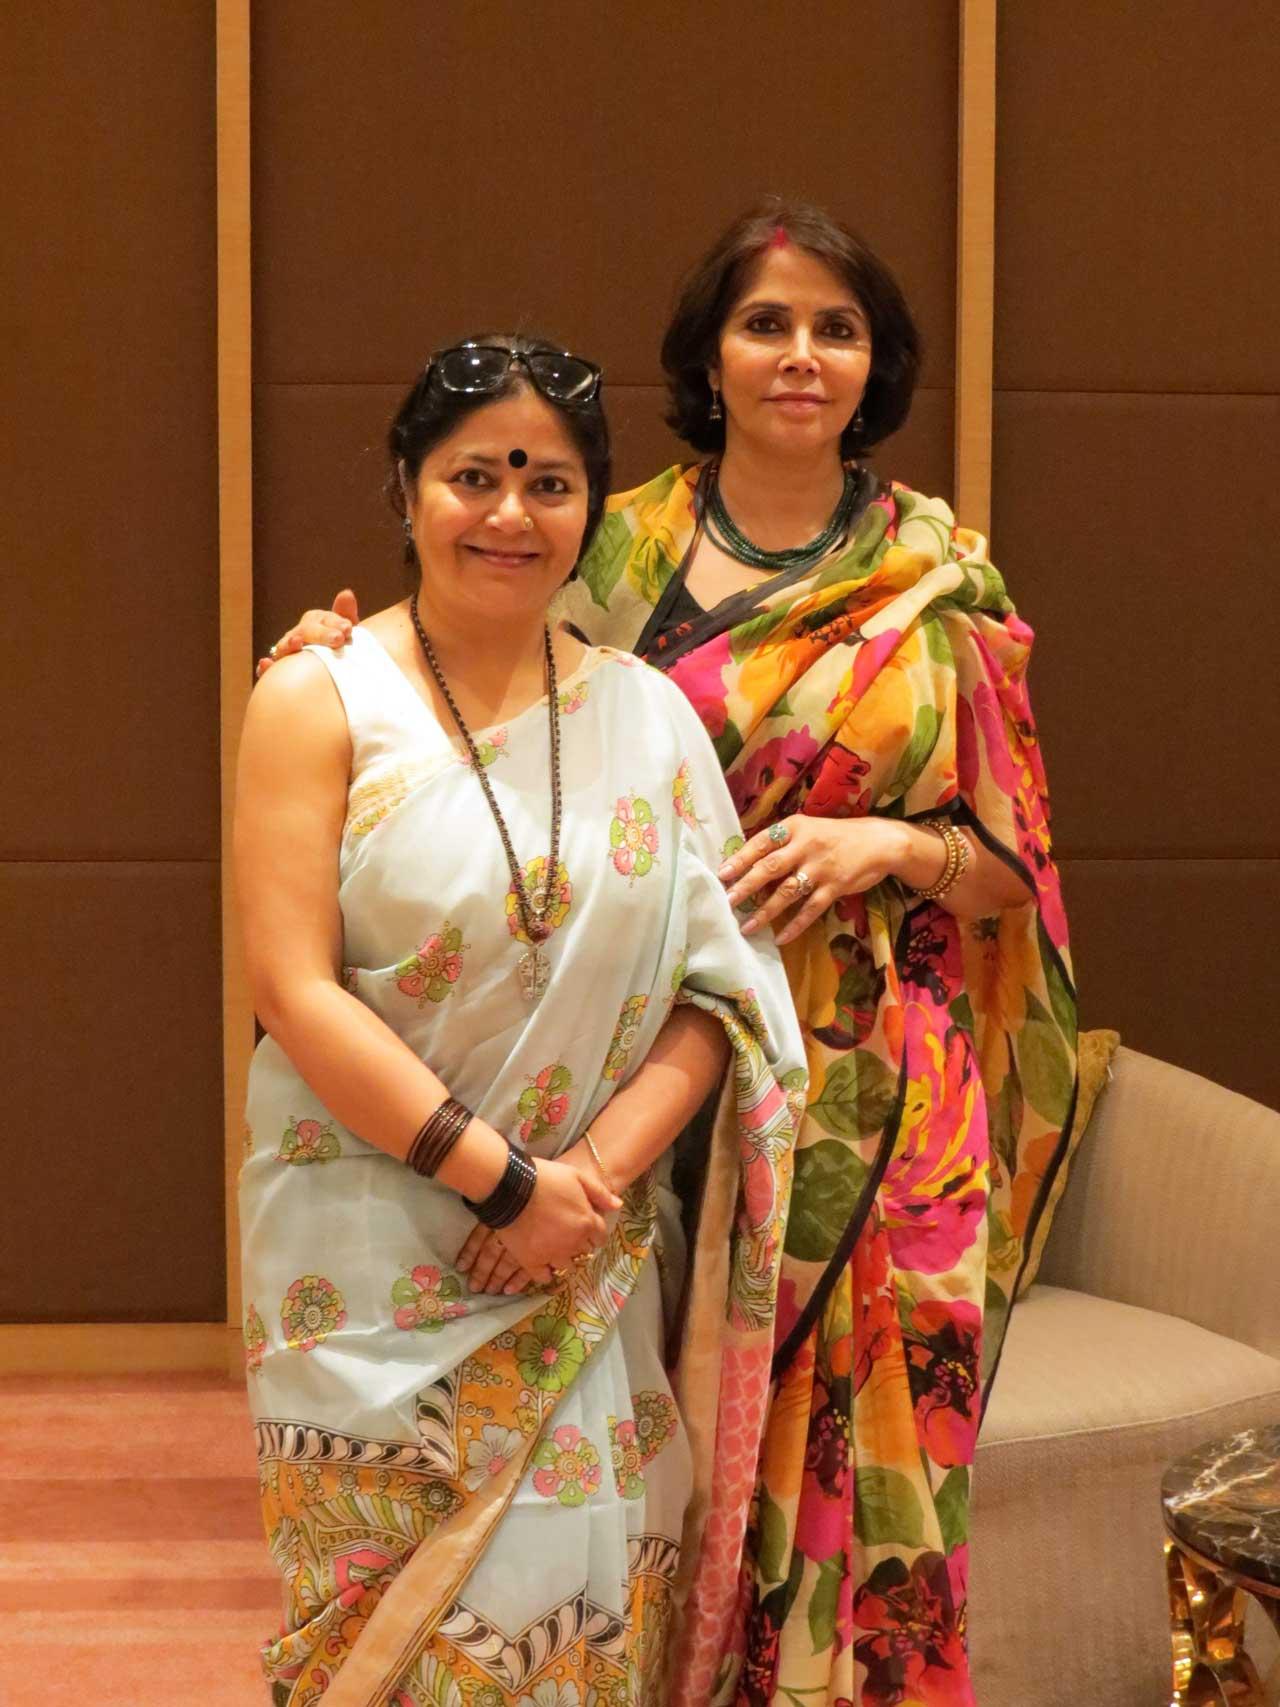 Ehsaas-women-of-Lucknow-Dimple-Trivedi-and-Kanak-Rekha-Chauhan